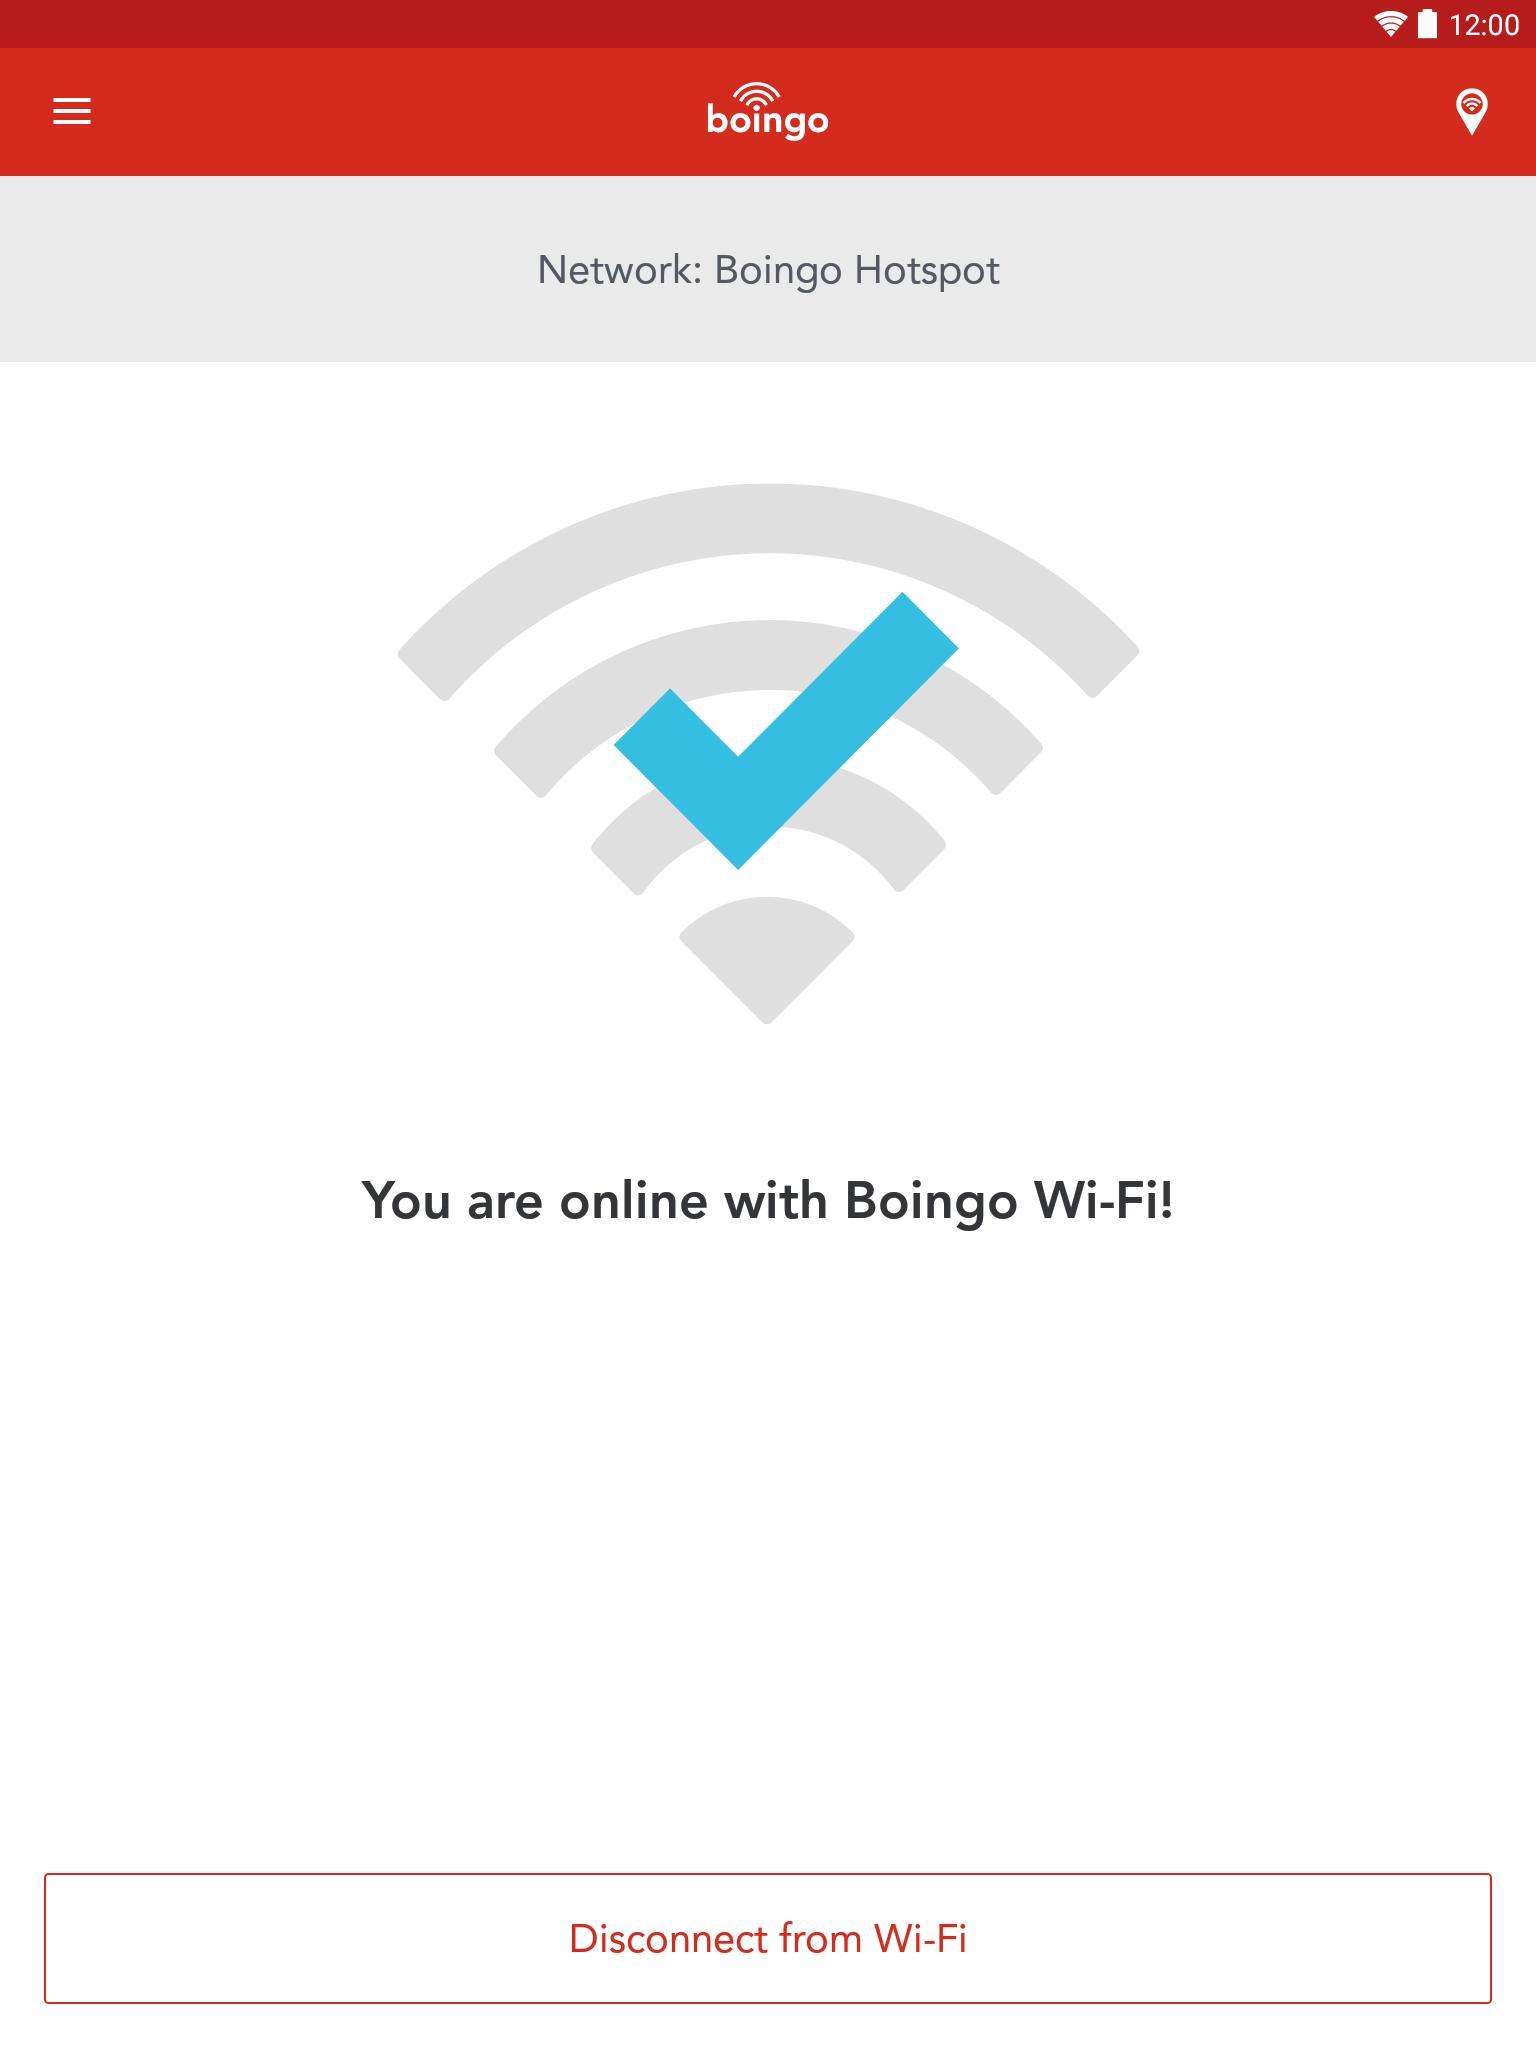 boingo wifi software download